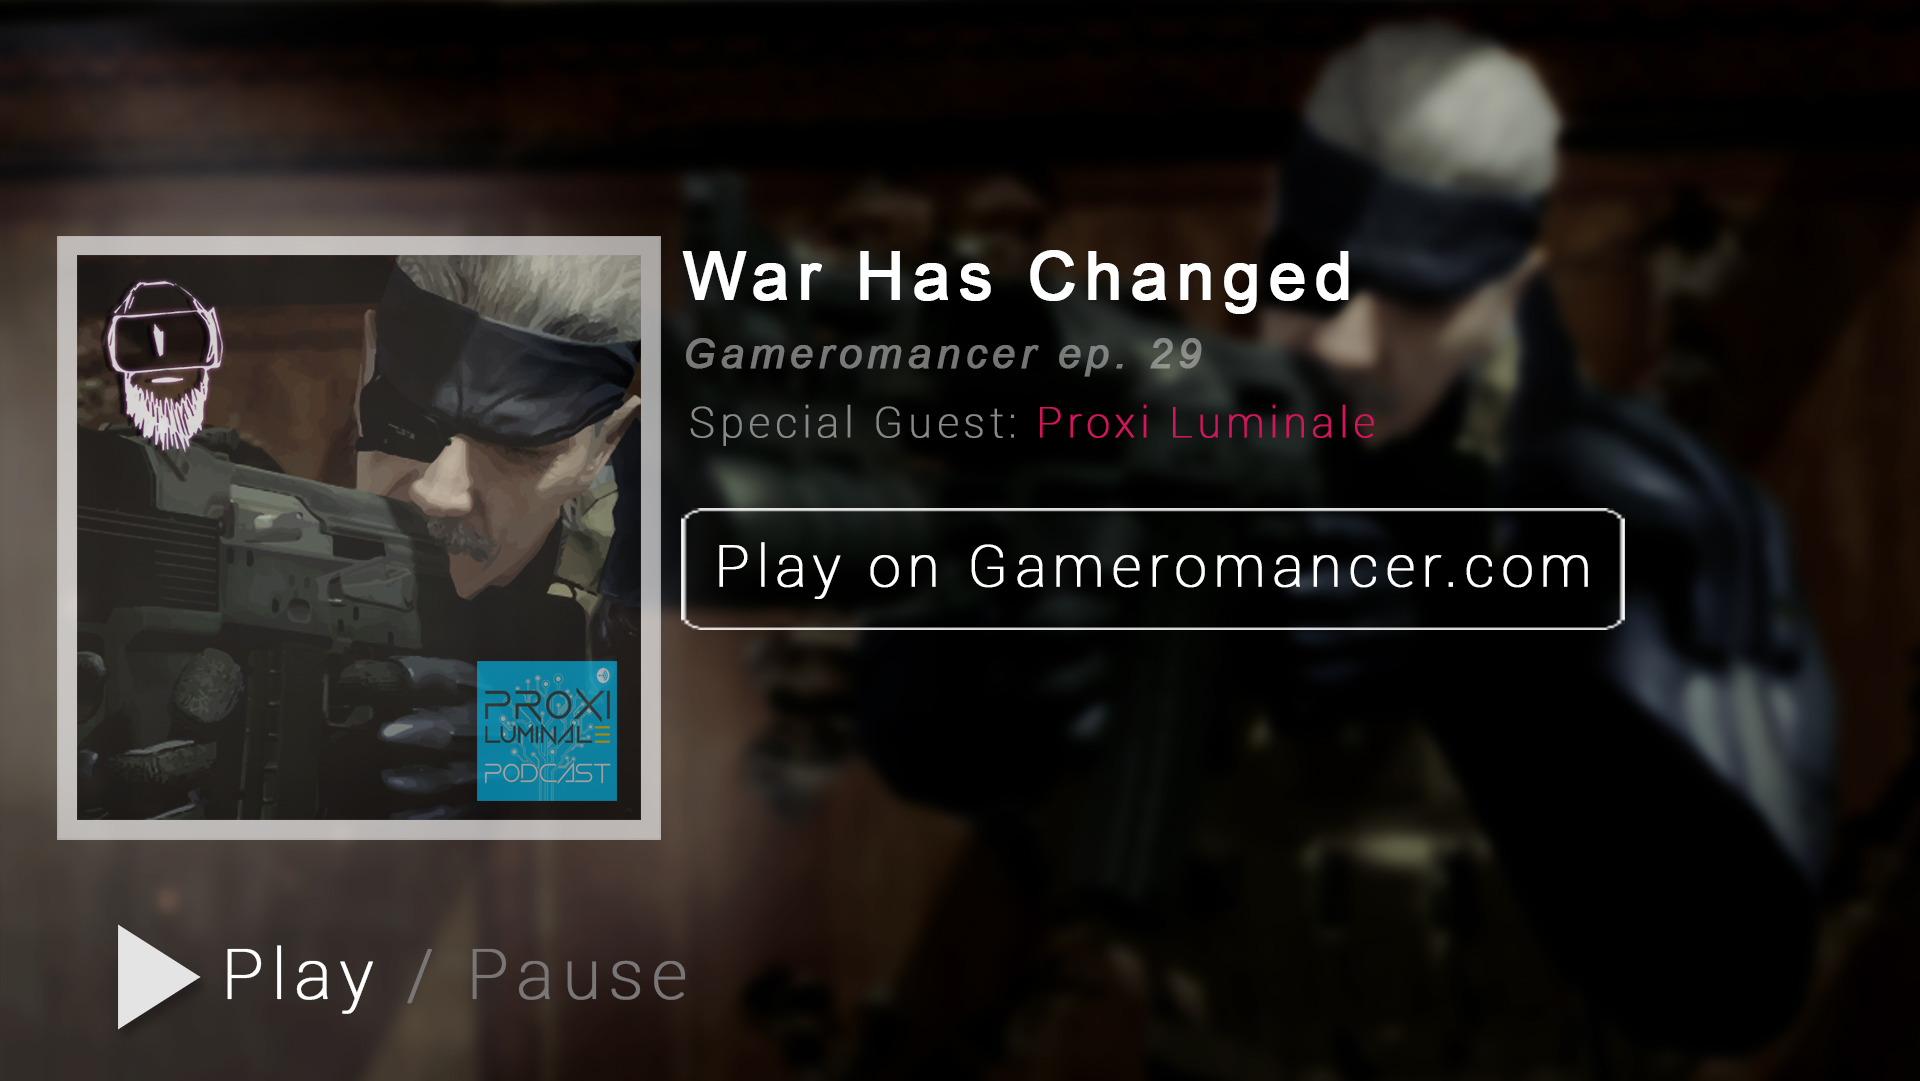 Gameromancer Ep. 29: War Has Changed